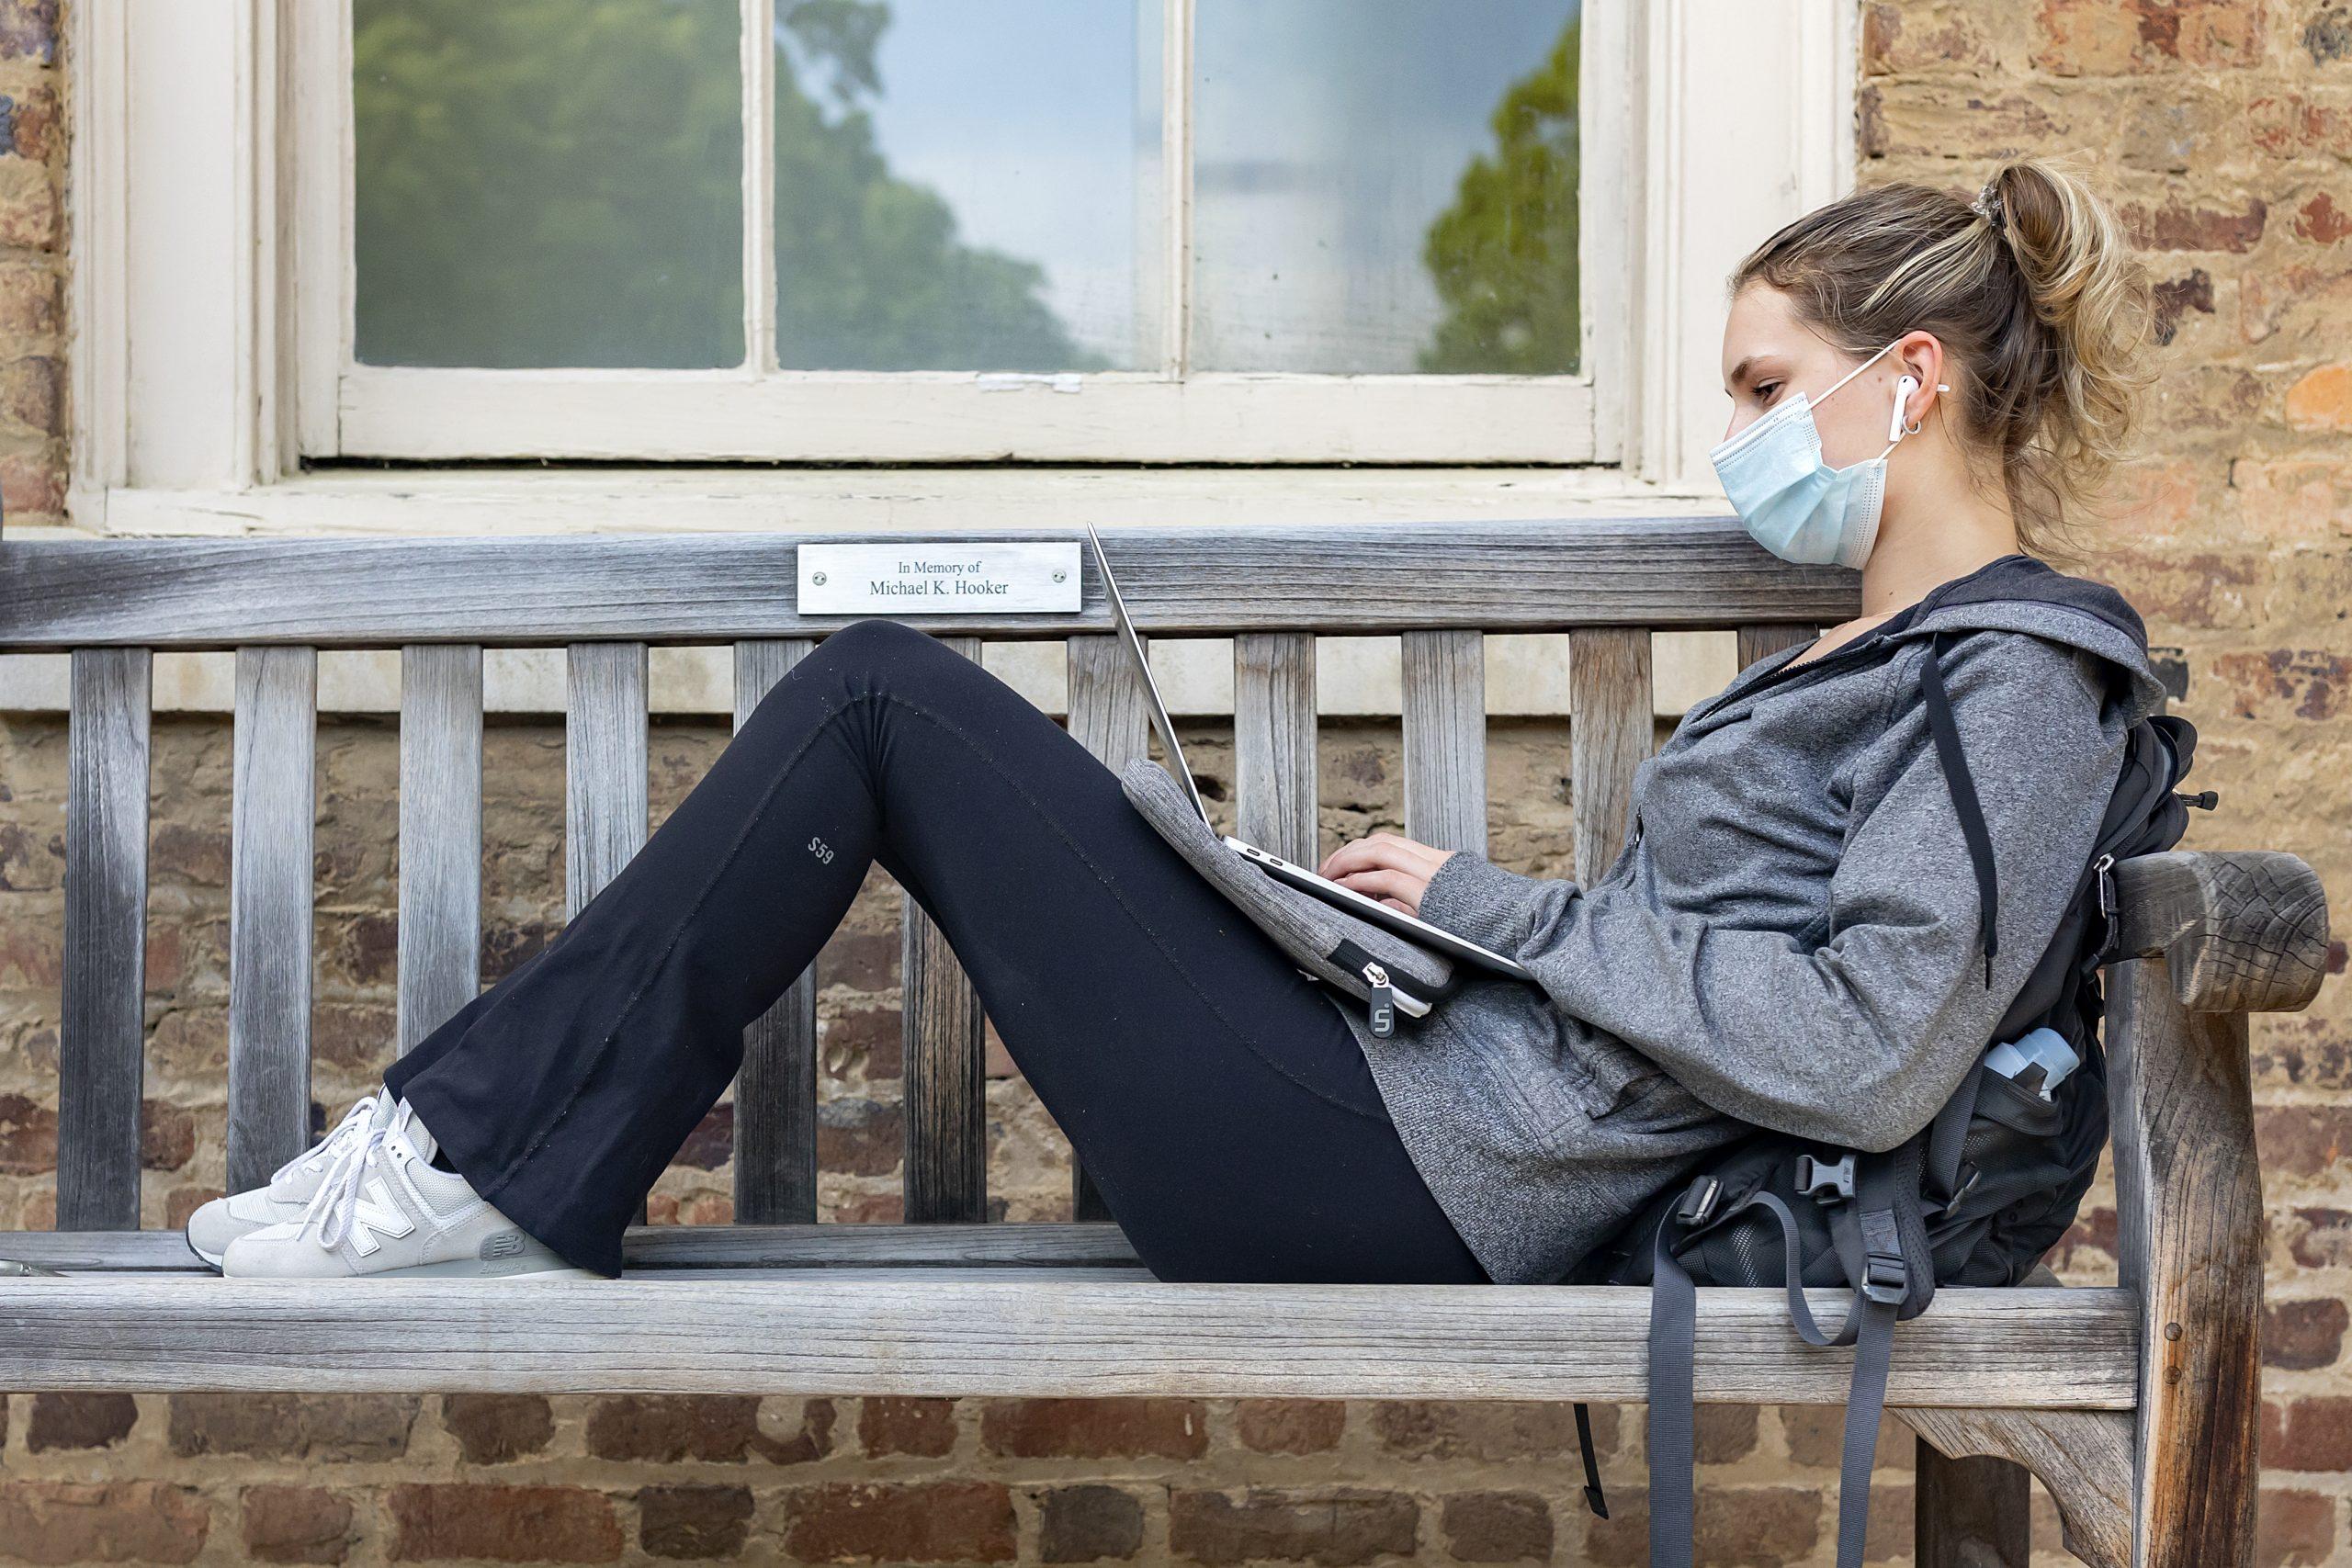 Woman studying outside